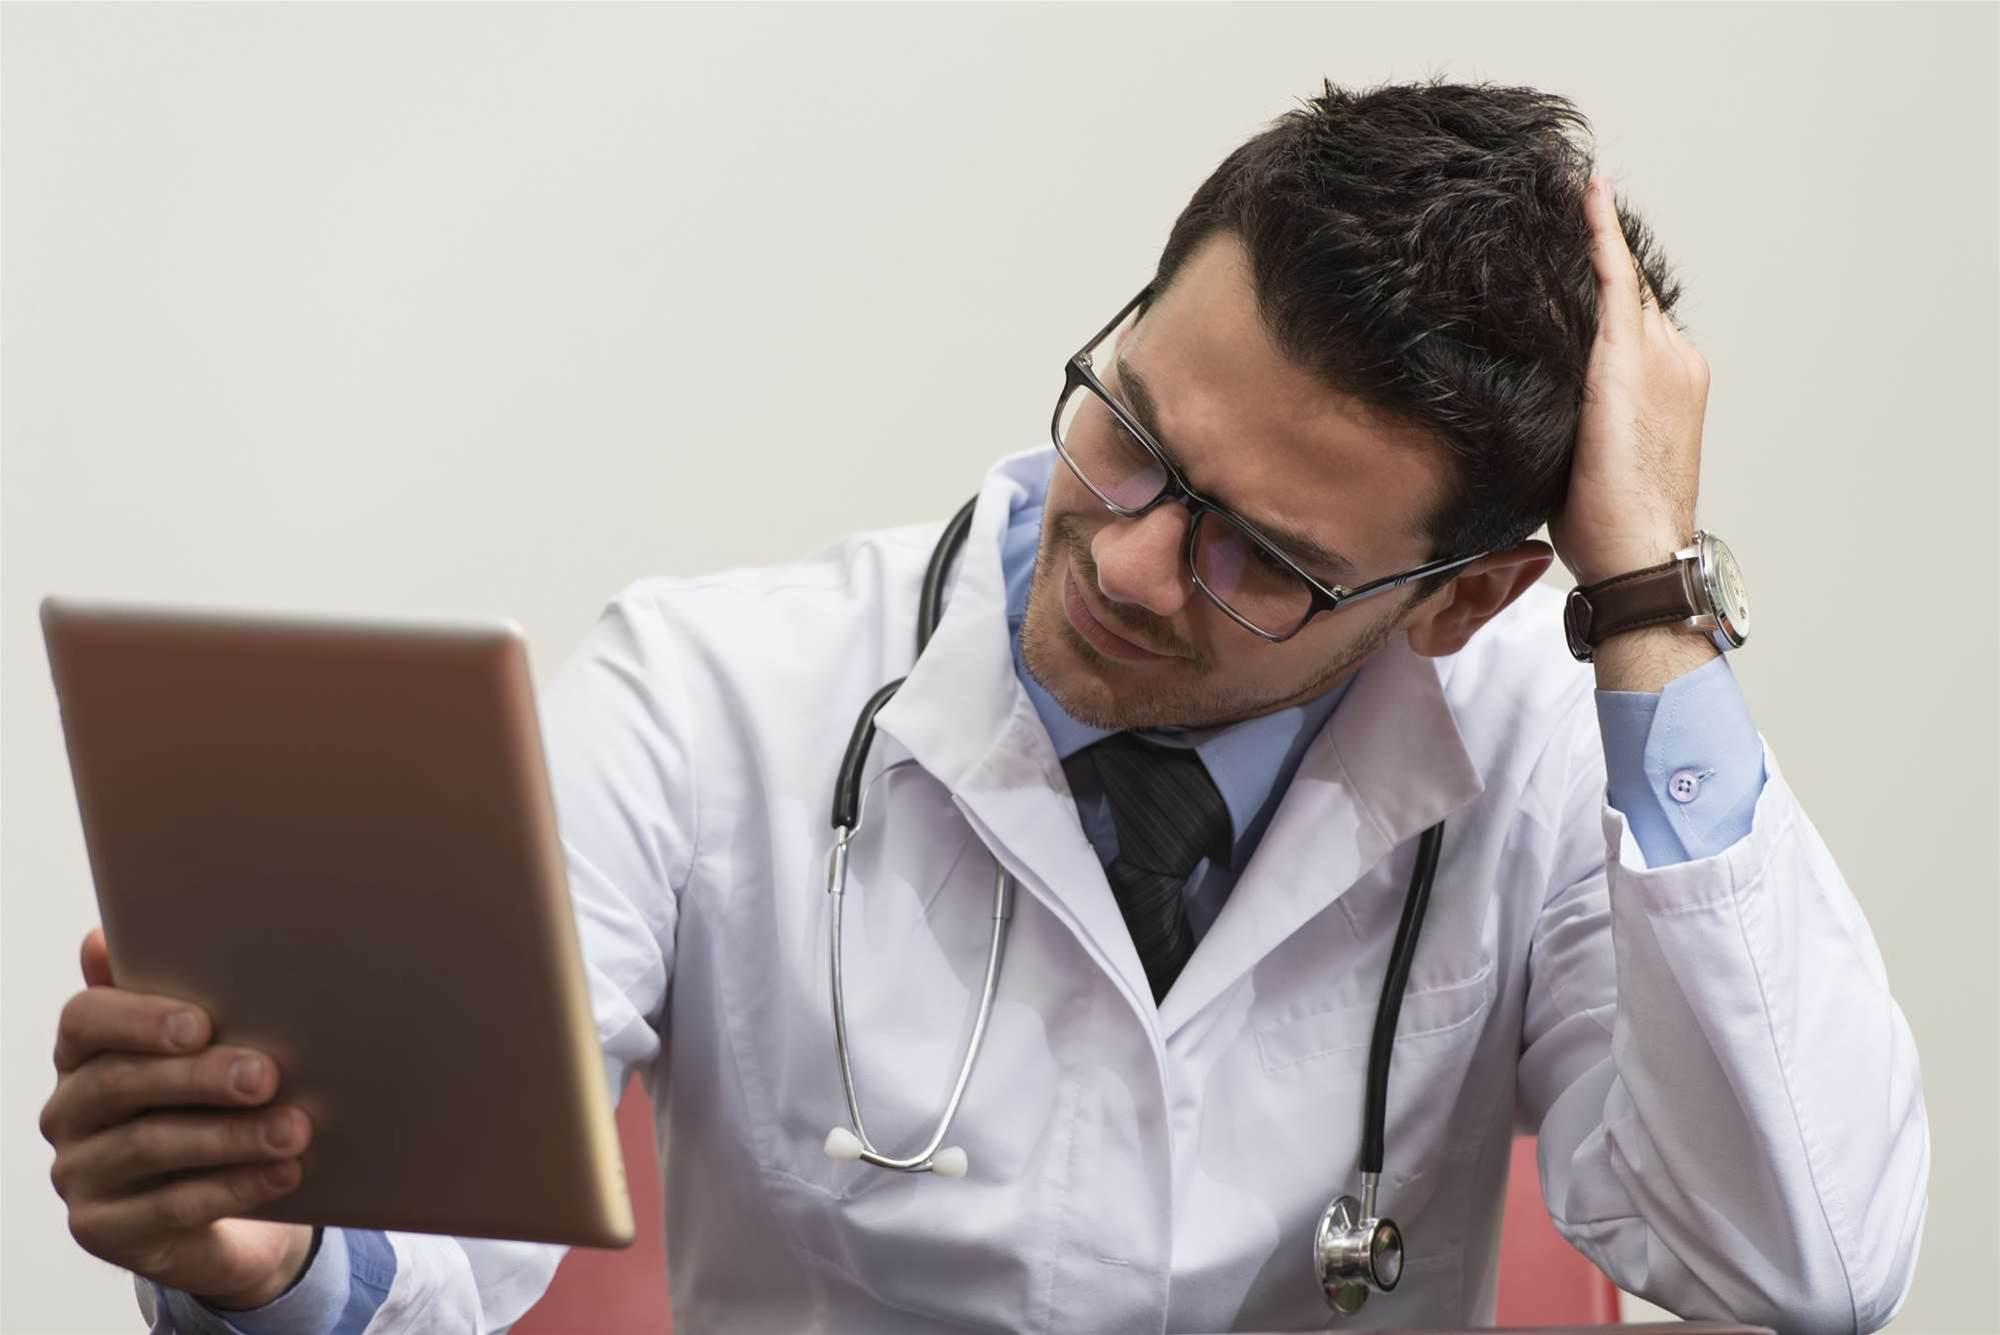 SA Health hopes new hardware will fix sluggish EPAS